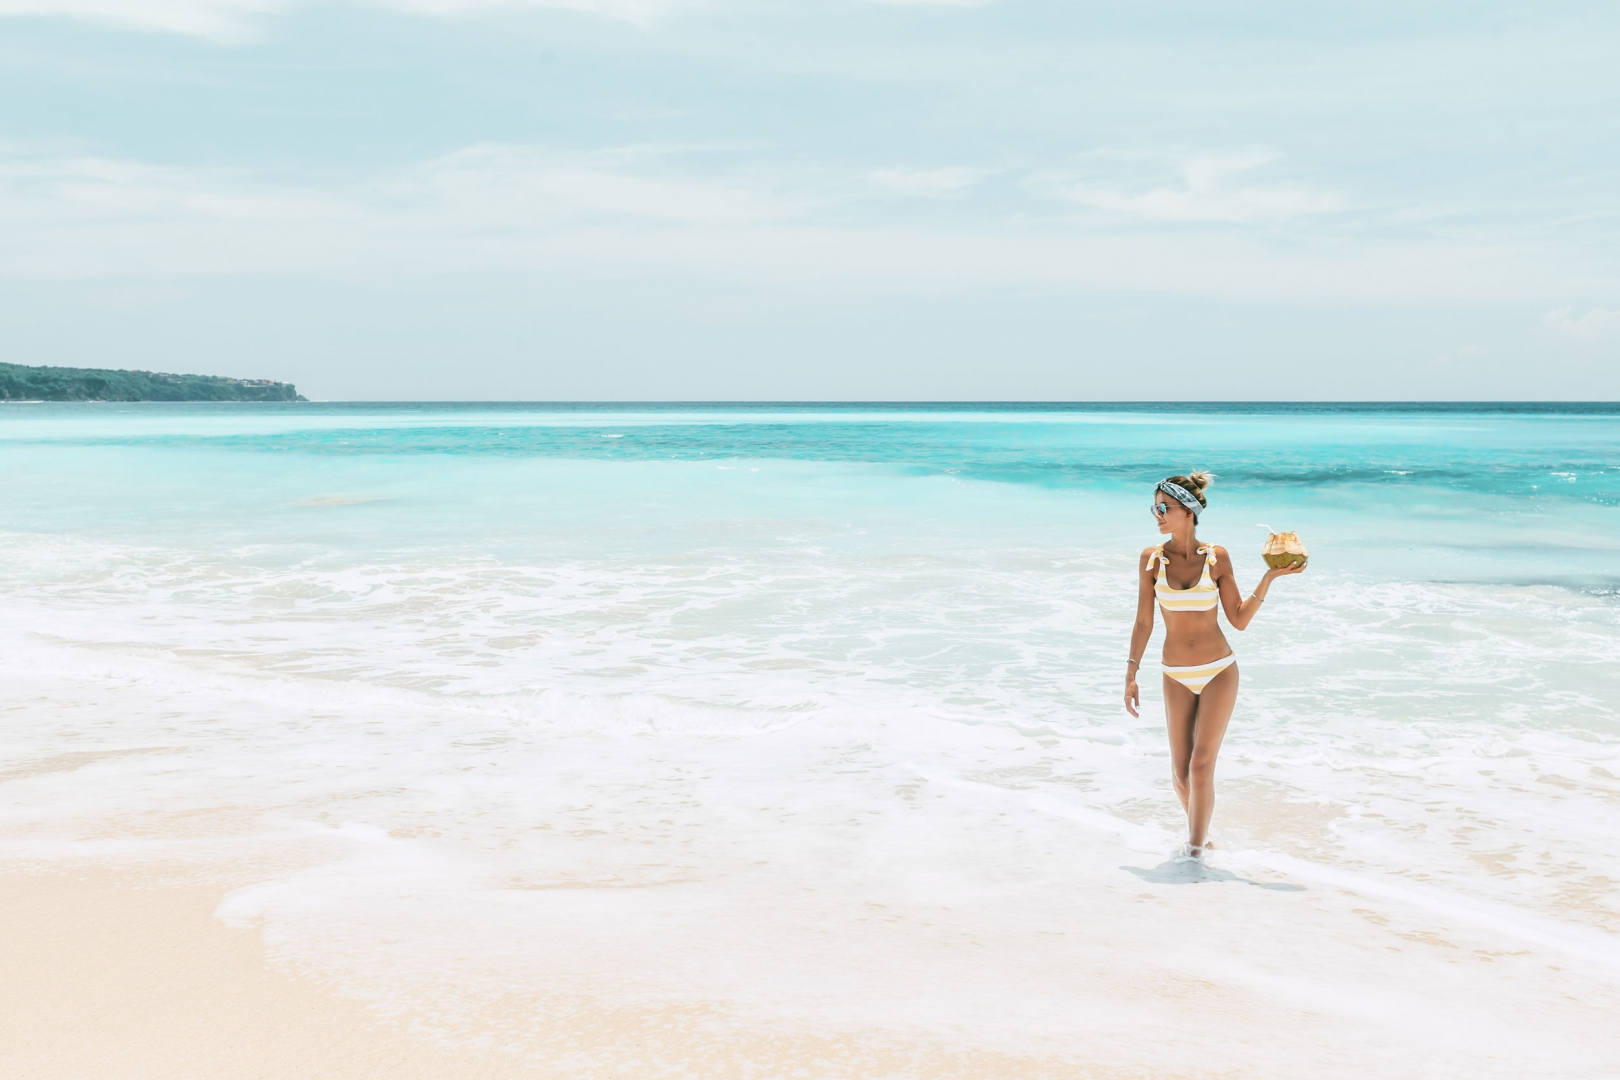 La belle vie à Bali !